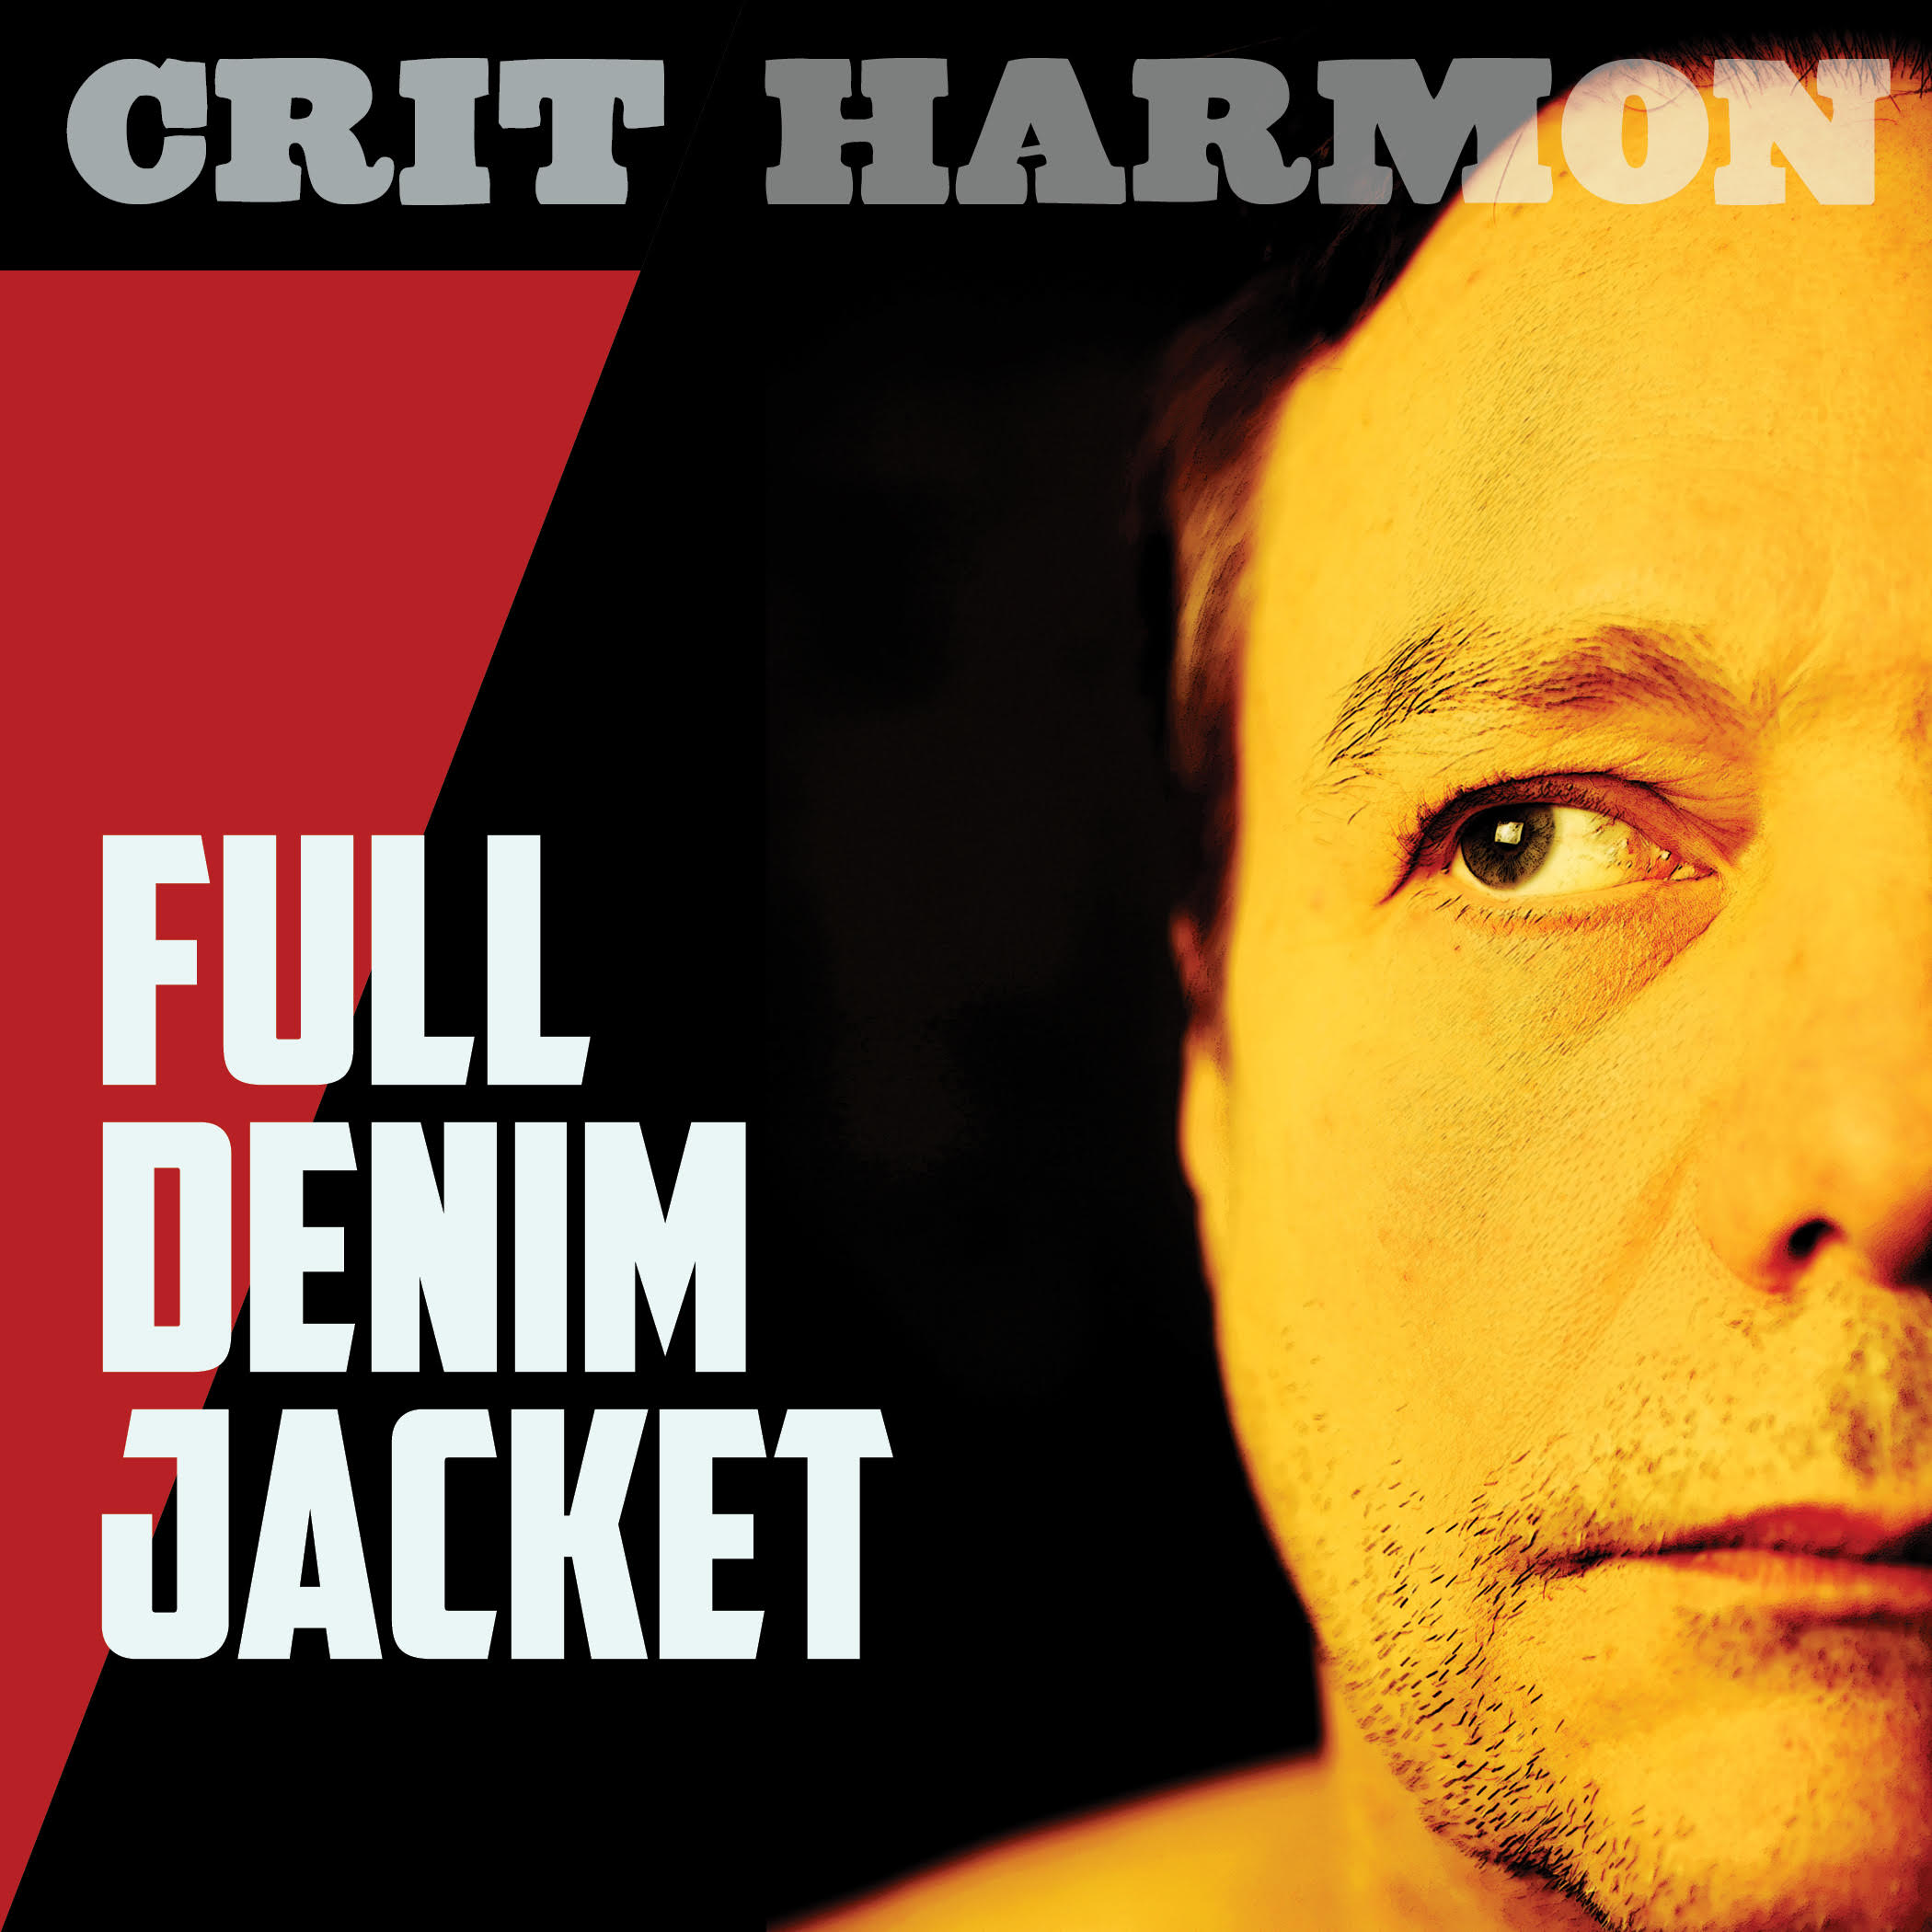 Crit Harmon - Full Denim Jacket